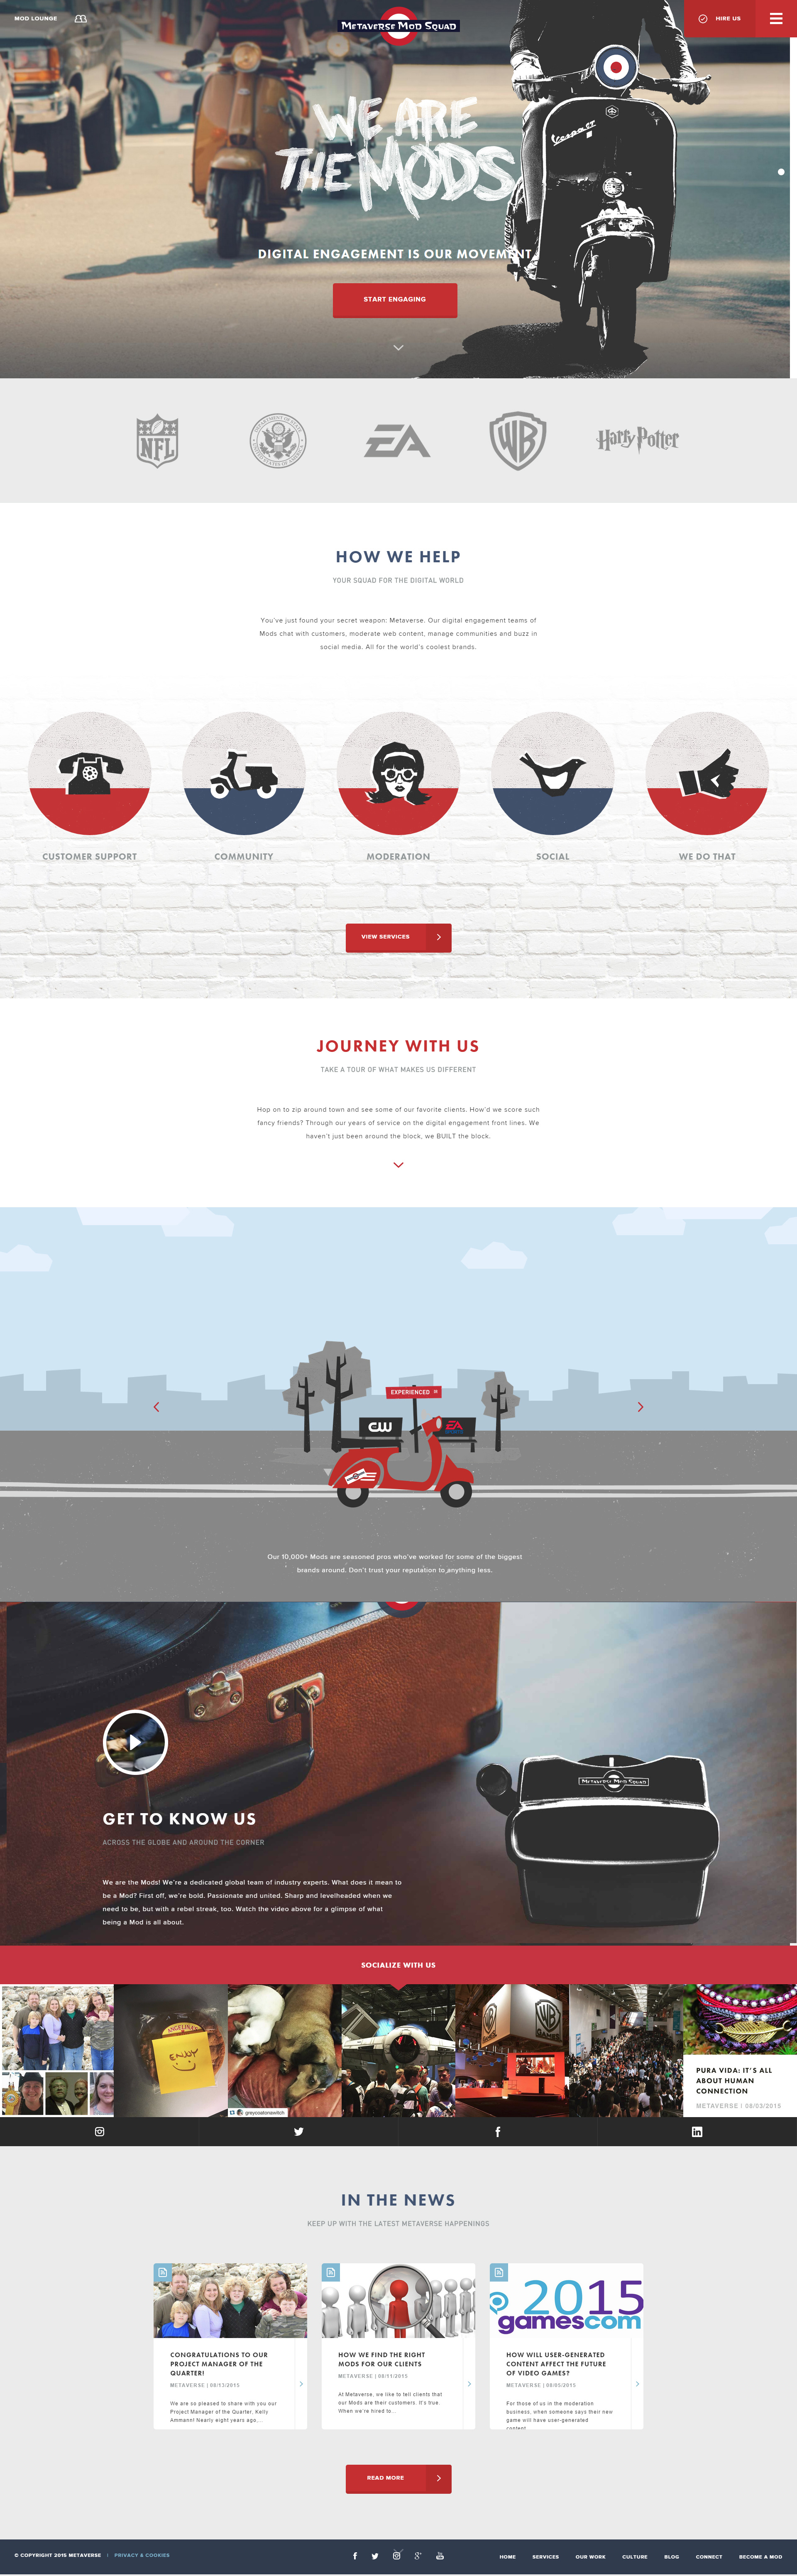 Metaverse Mod Squad Inspirational Web Designs Web Design Web Design Projects Mod Squad